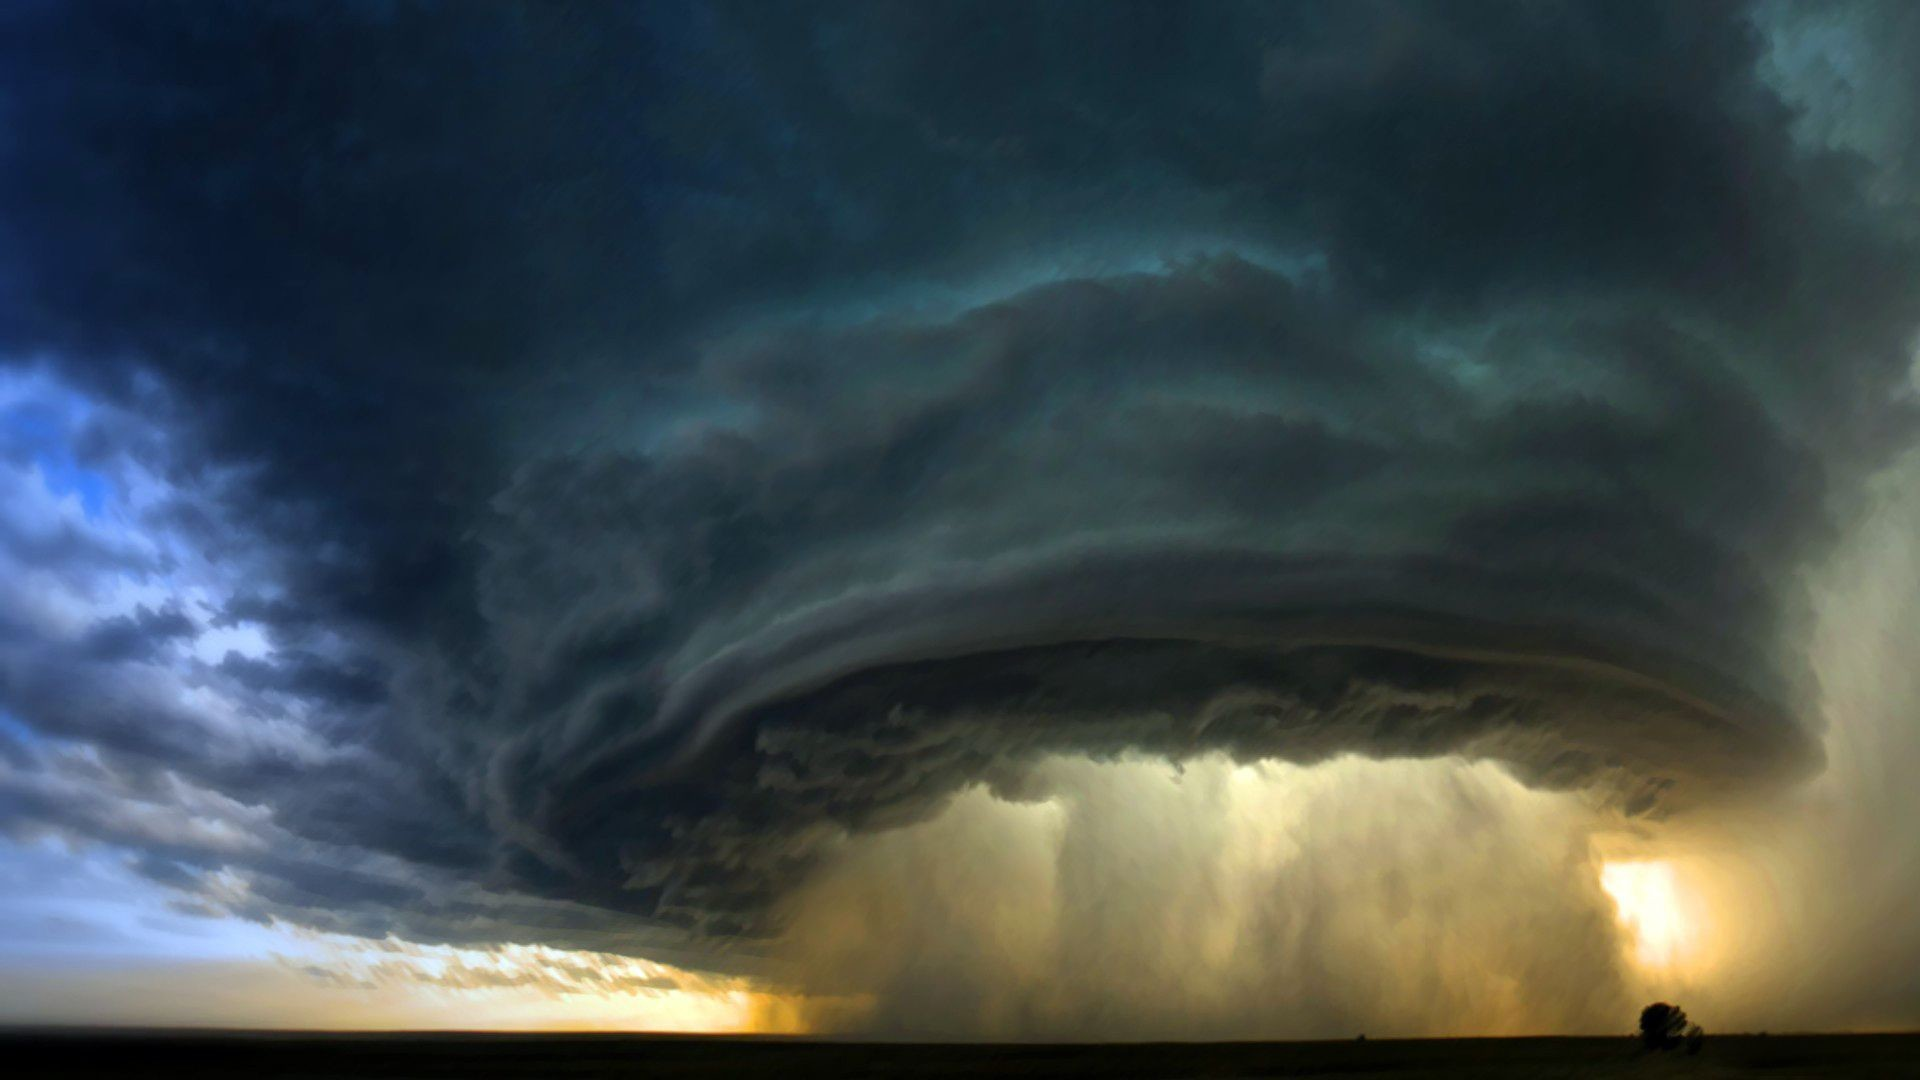 Res: 1920x1080, HD Quality Amazing Nature Tornado Wallpaper 5 - SiWallpaper 13422